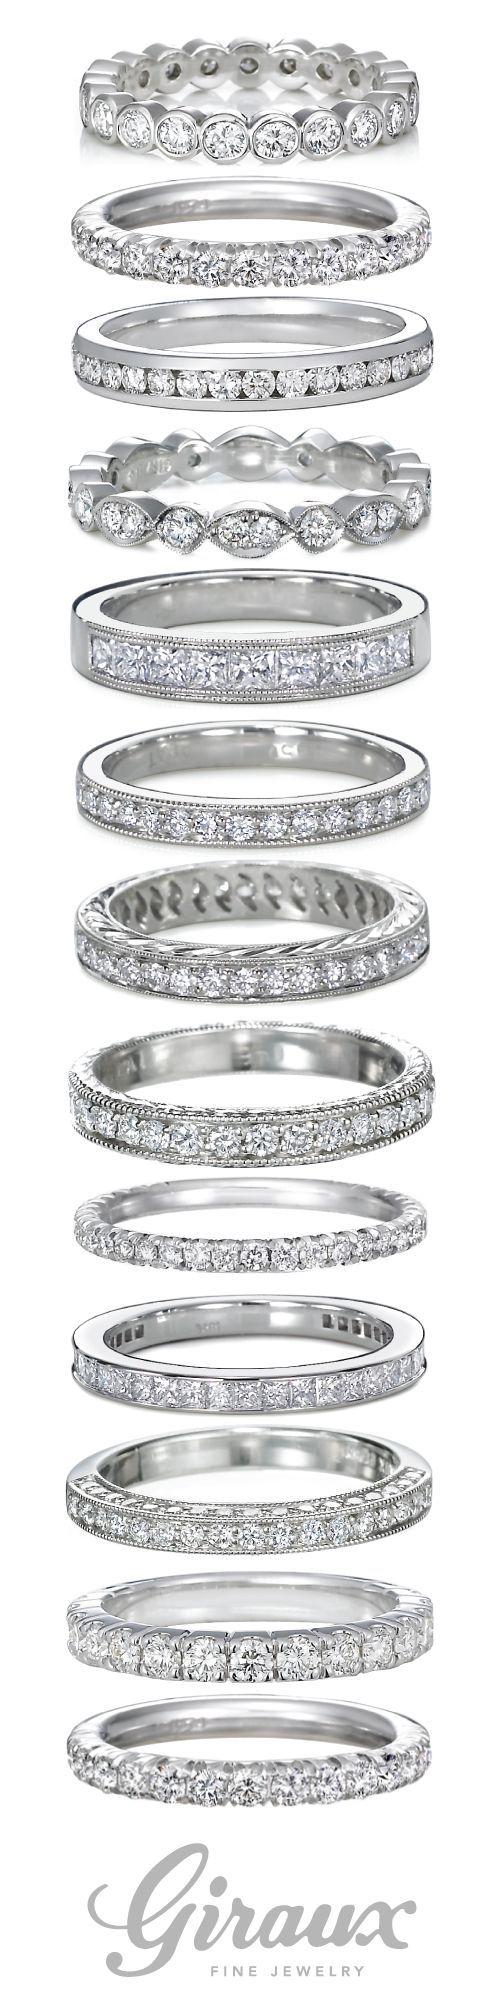 engagement rings and wedding bands / http://www.himisspuff.com/engagement-rings-wedding-rings/19/ anillos de compromiso | alianzas de boda | anillos de compromiso baratos http://amzn.to/297uk4t